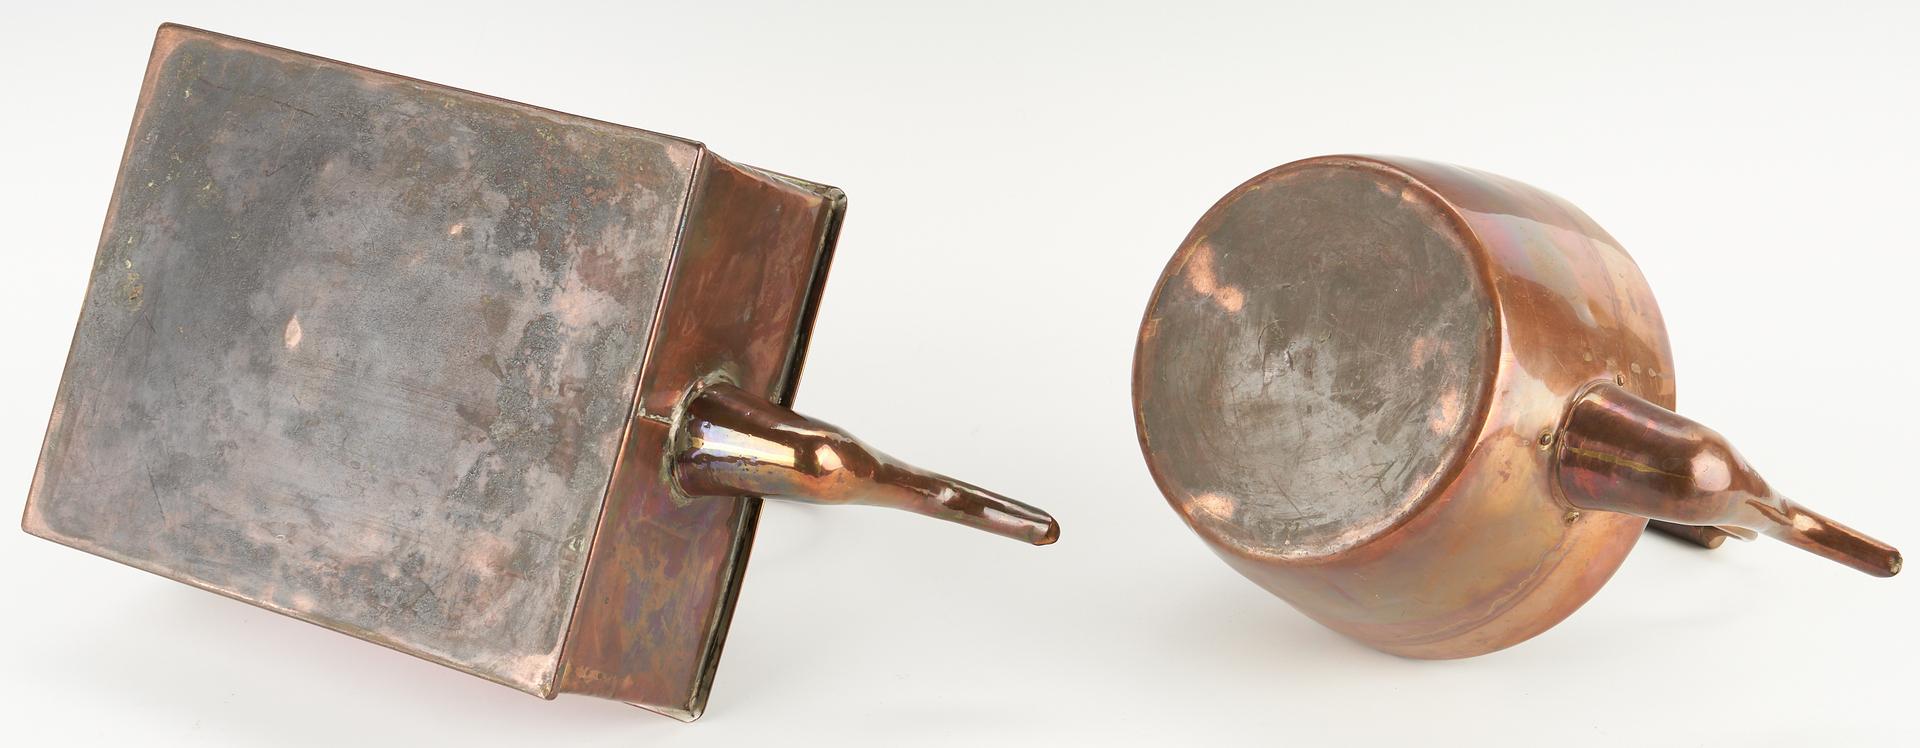 Lot 1046: 2 Copper Kettles & Stands, Charles K. Davis Collection